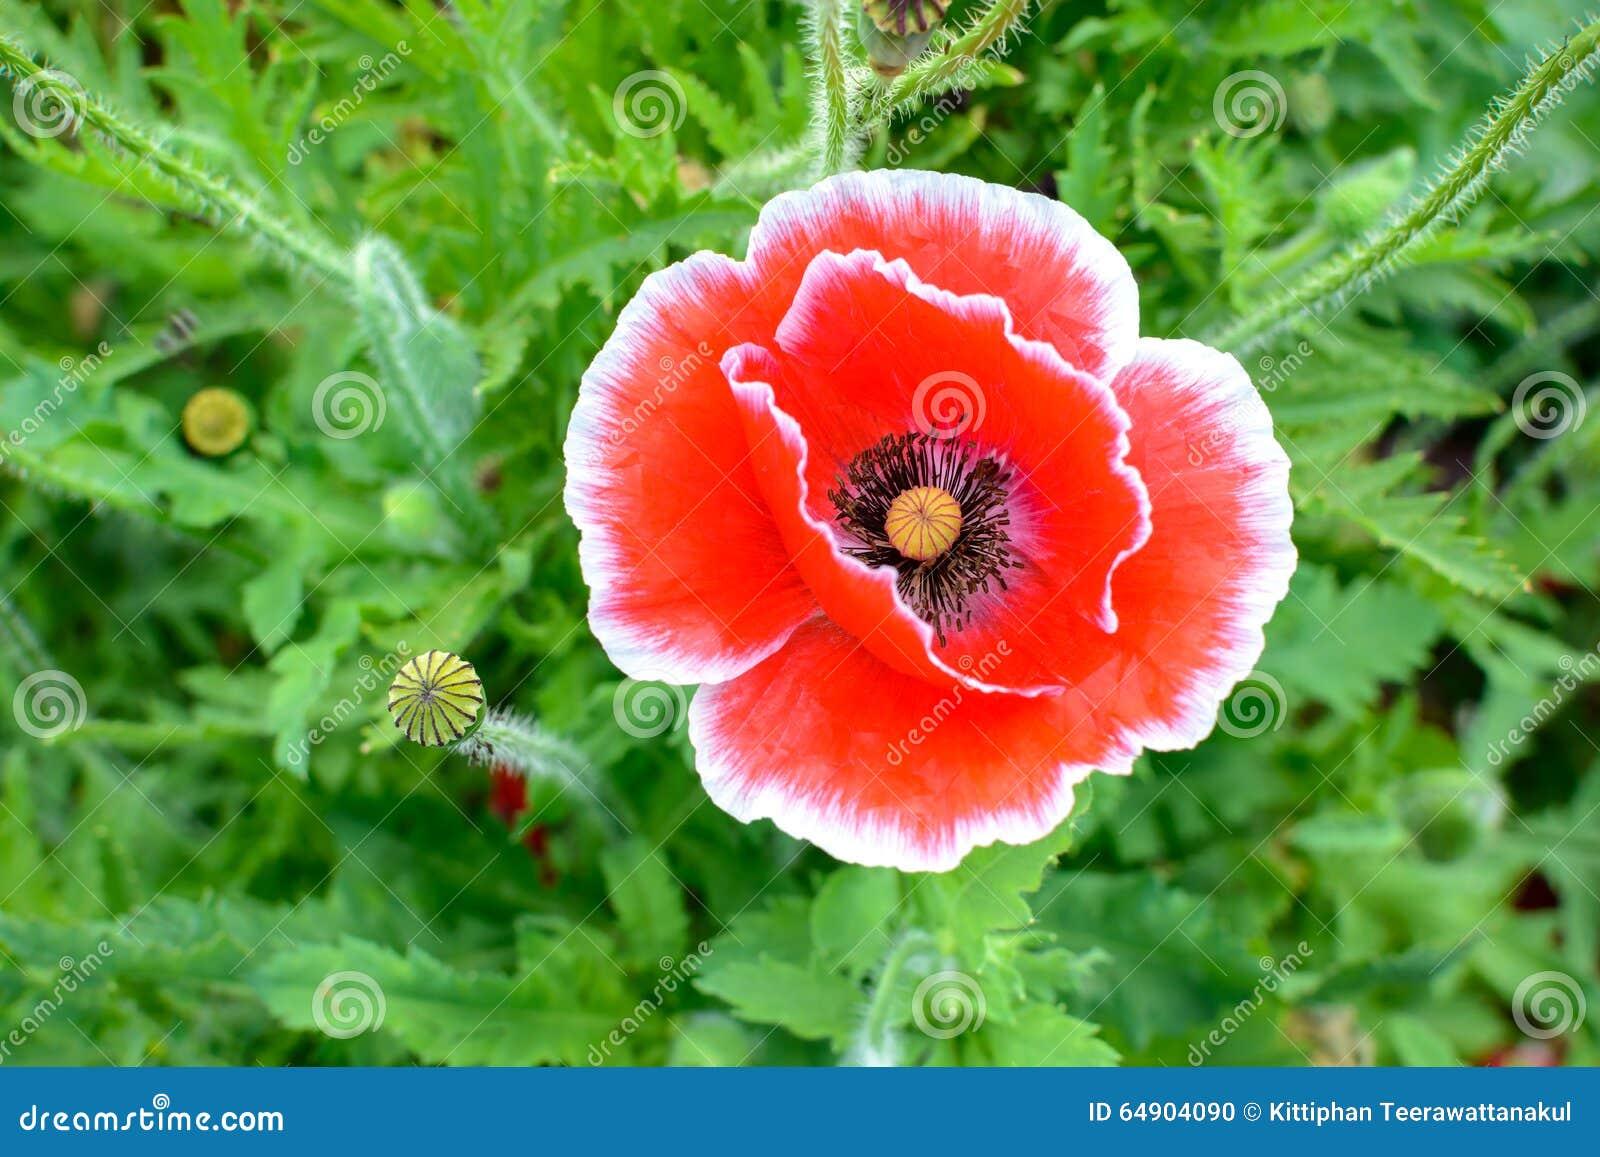 Red Opium Poppy Flower Stock Photo Image Of Nature 64904090